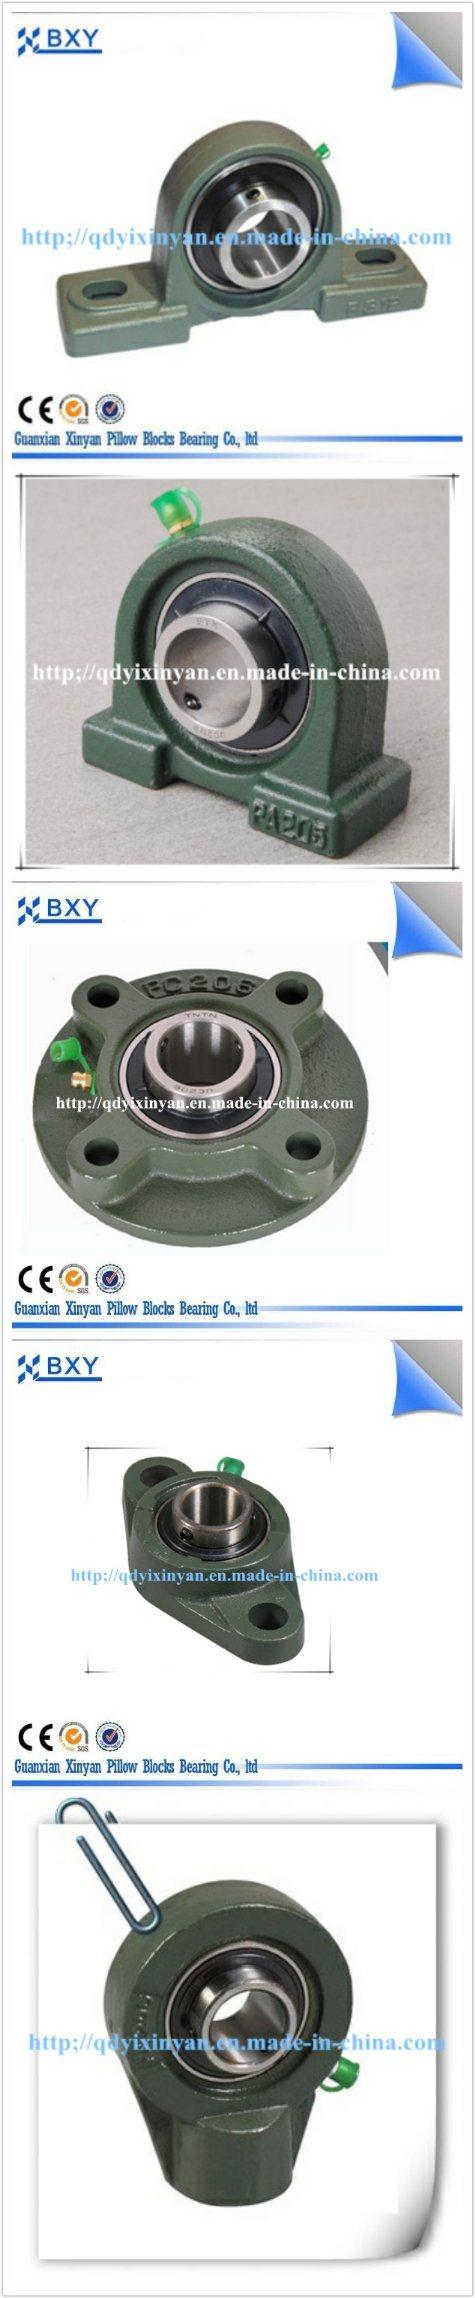 Insert Bearing SA 201-8 SA202-9 SA202-10 SA203-11 SA201 SA202 SA203/Bearing Housing